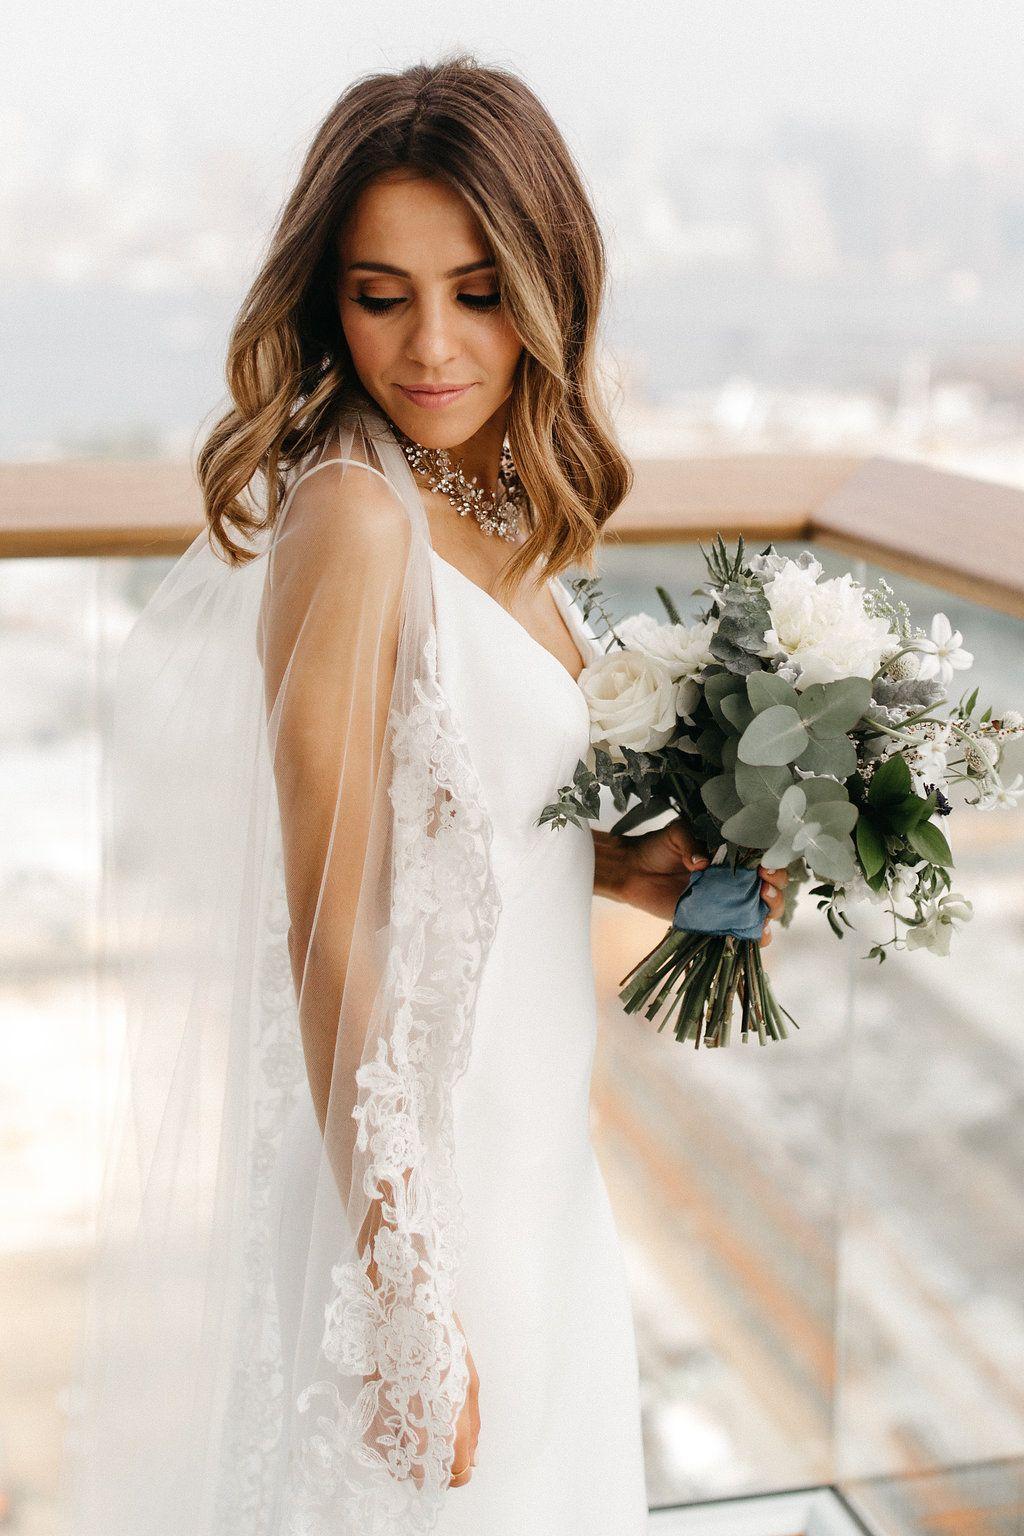 Summer Spring Wedding Dress Ideas Sleeveless Lace Wedding Dress